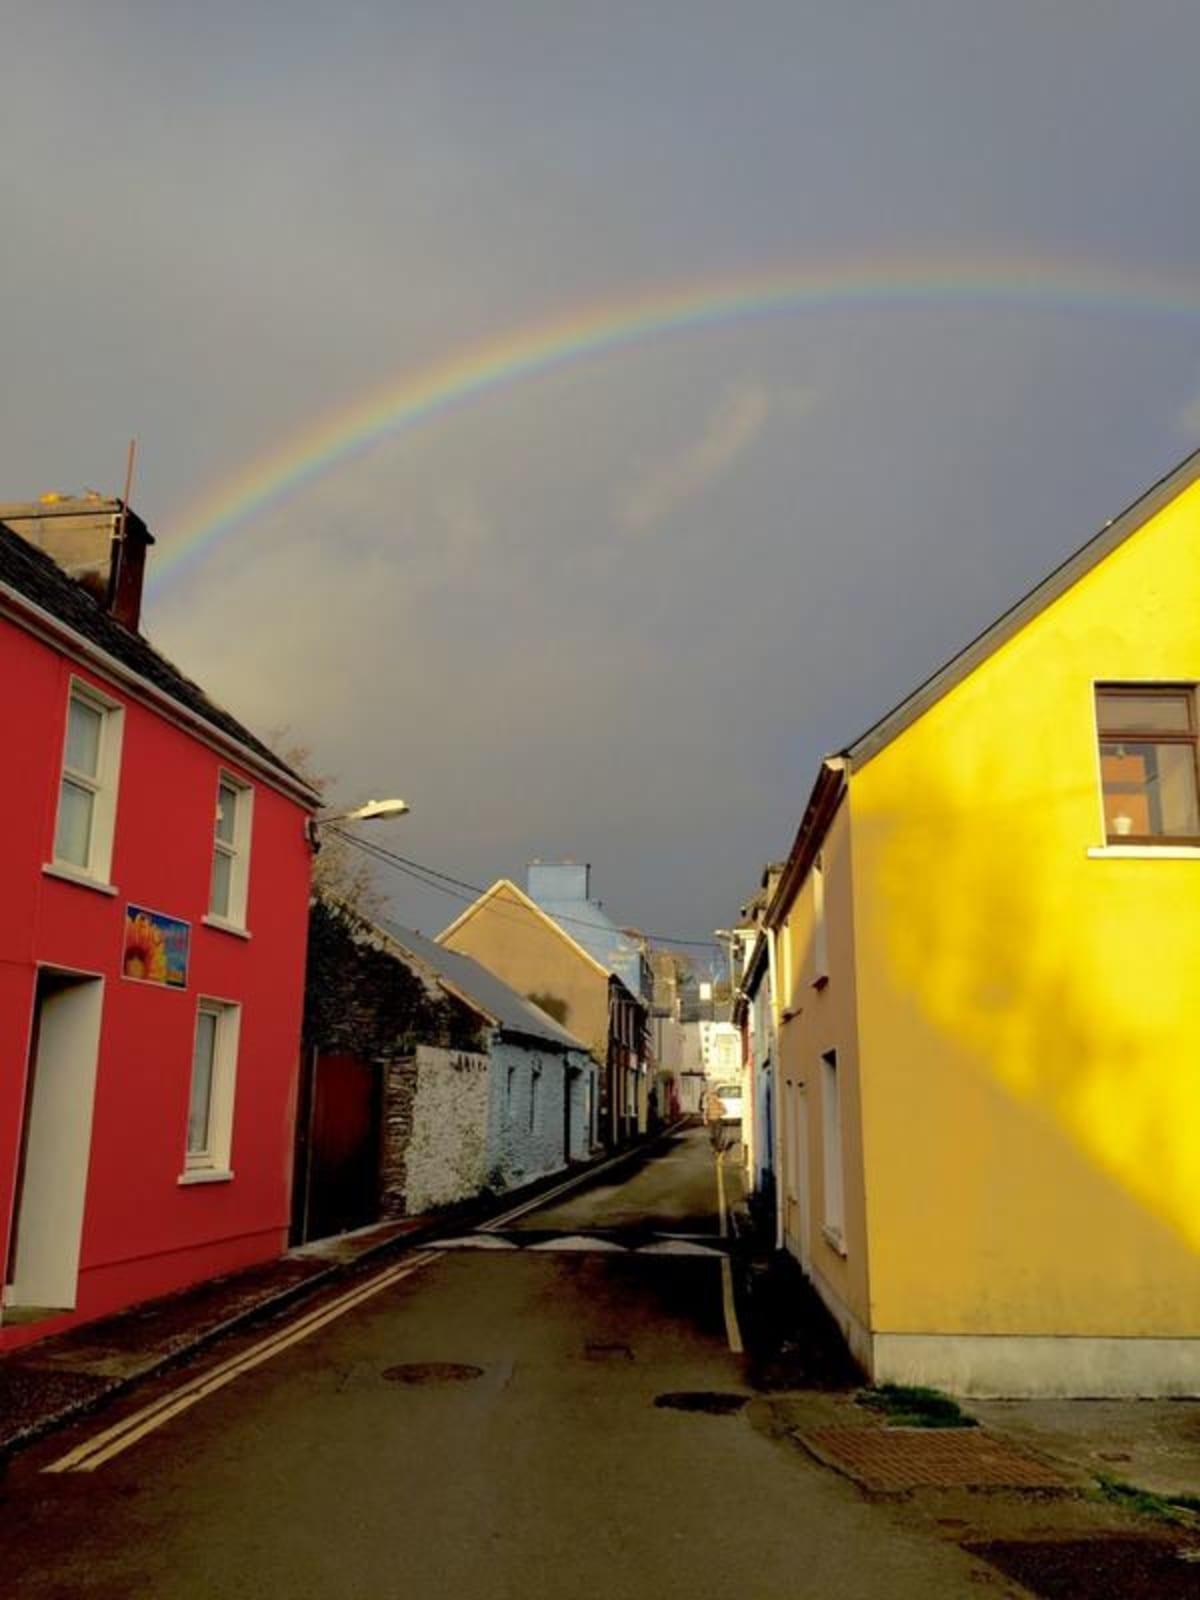 The Grapevine Hostel, Dingle, Ireland